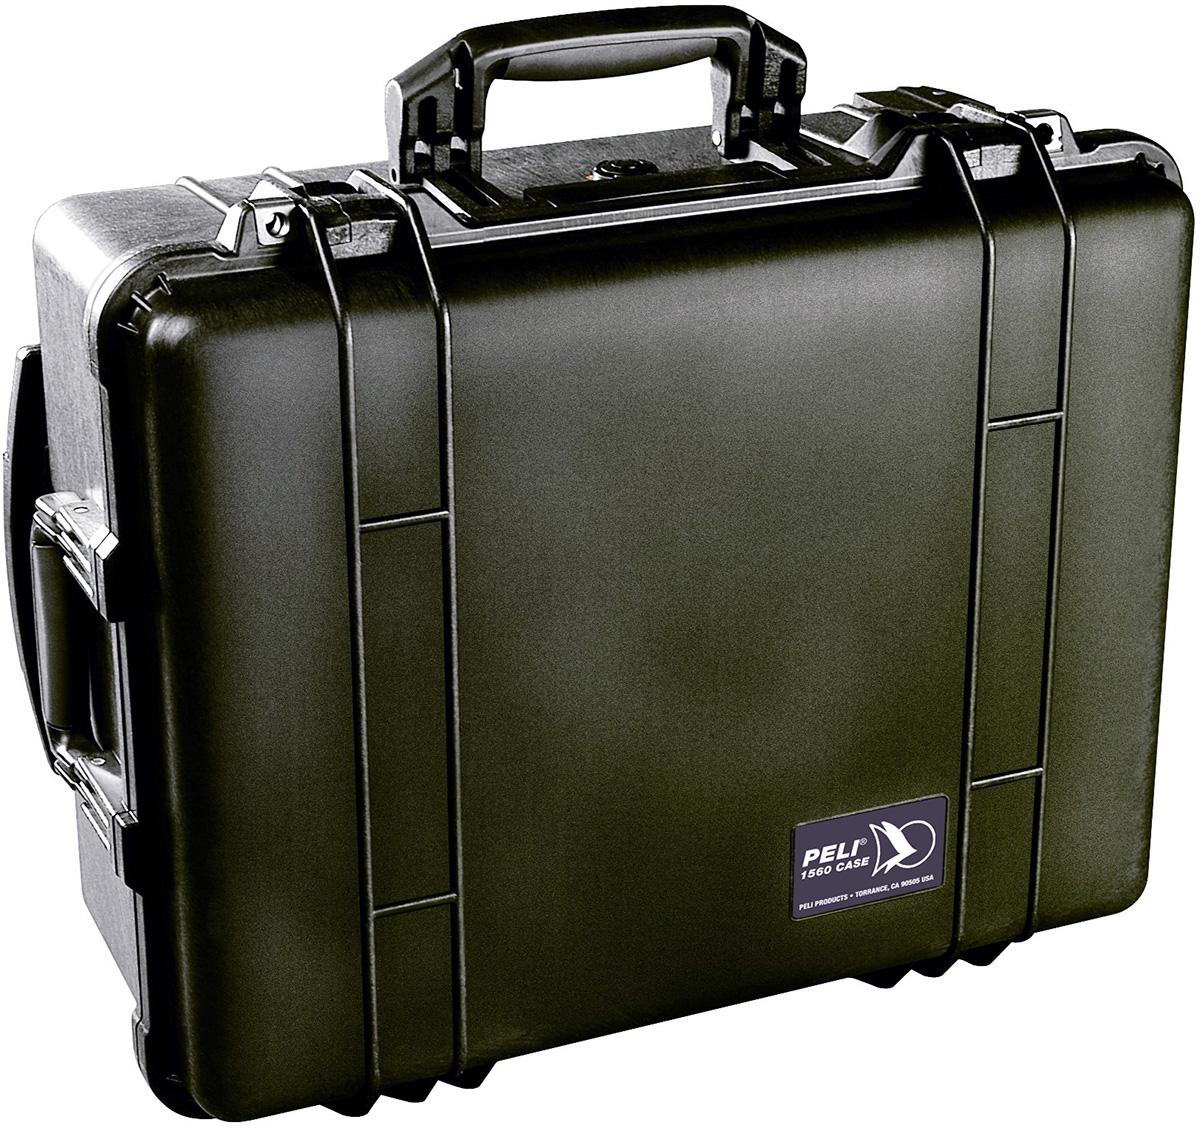 peli pelican products 1560 rolling travel hard case pelicases